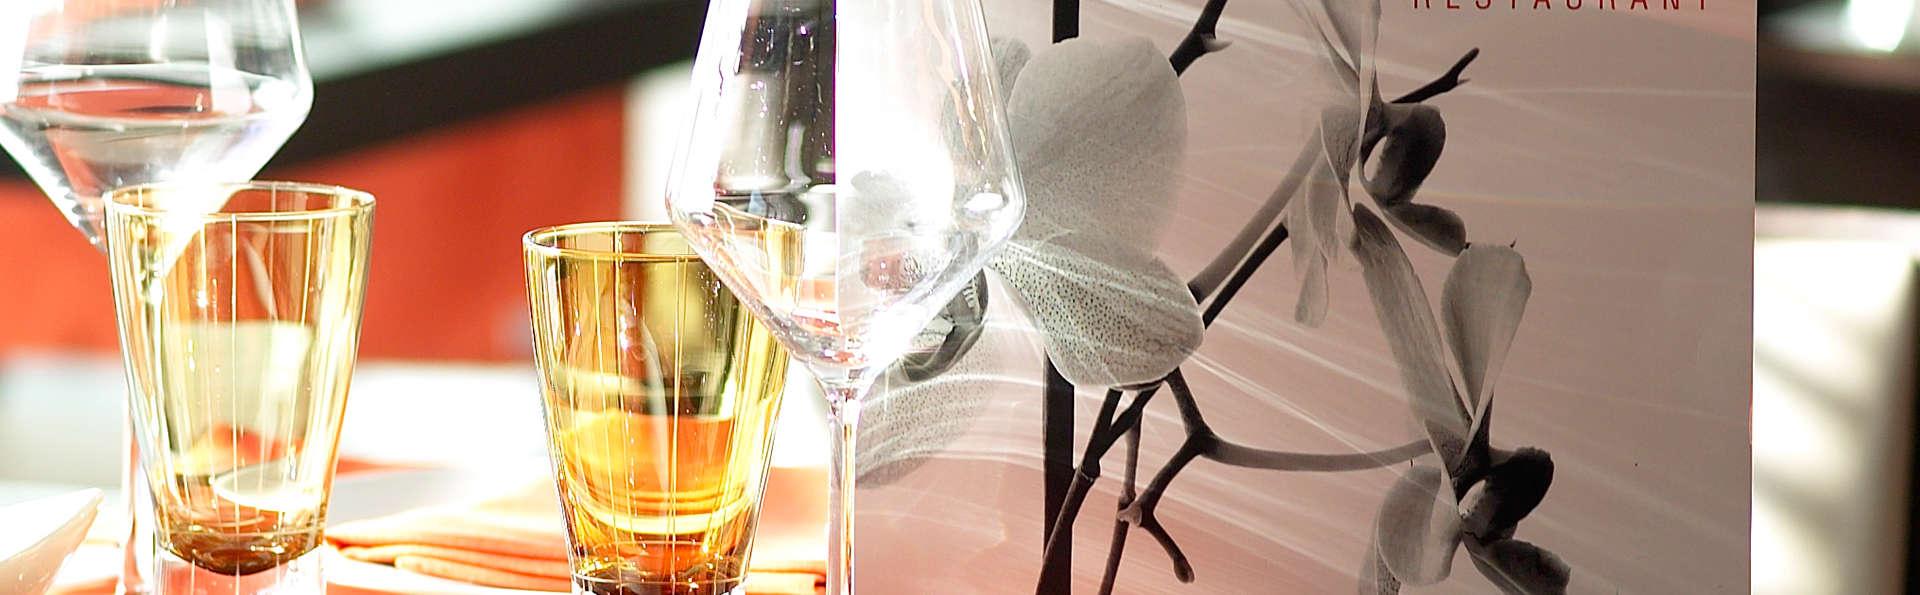 Radisson Blu Hotel Biarritz - edit_restaurant1.jpg